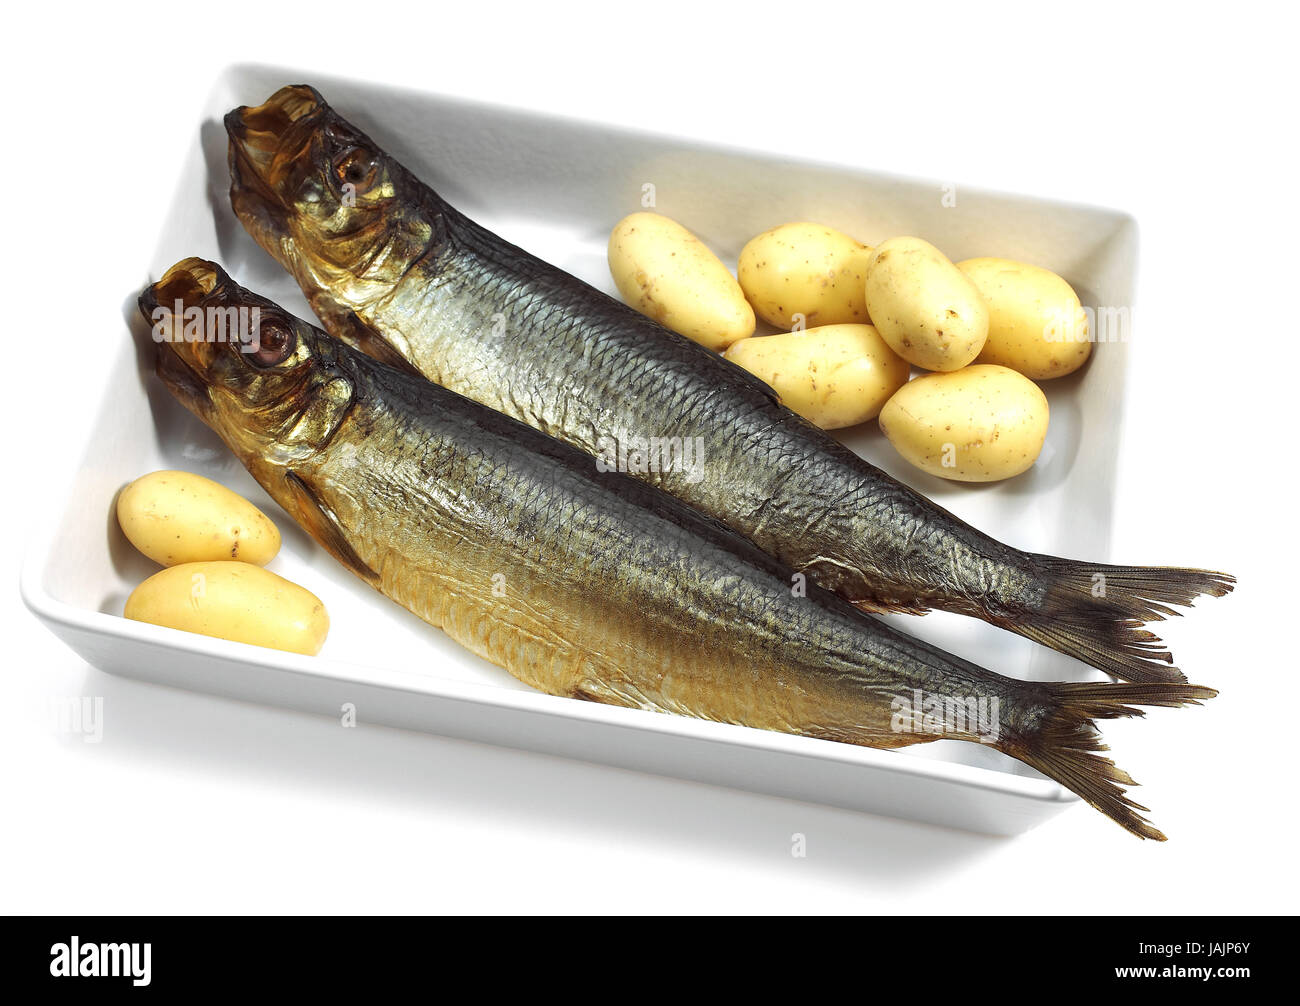 Kipper or bloater,Clupea harengus,potatoes, - Stock Image